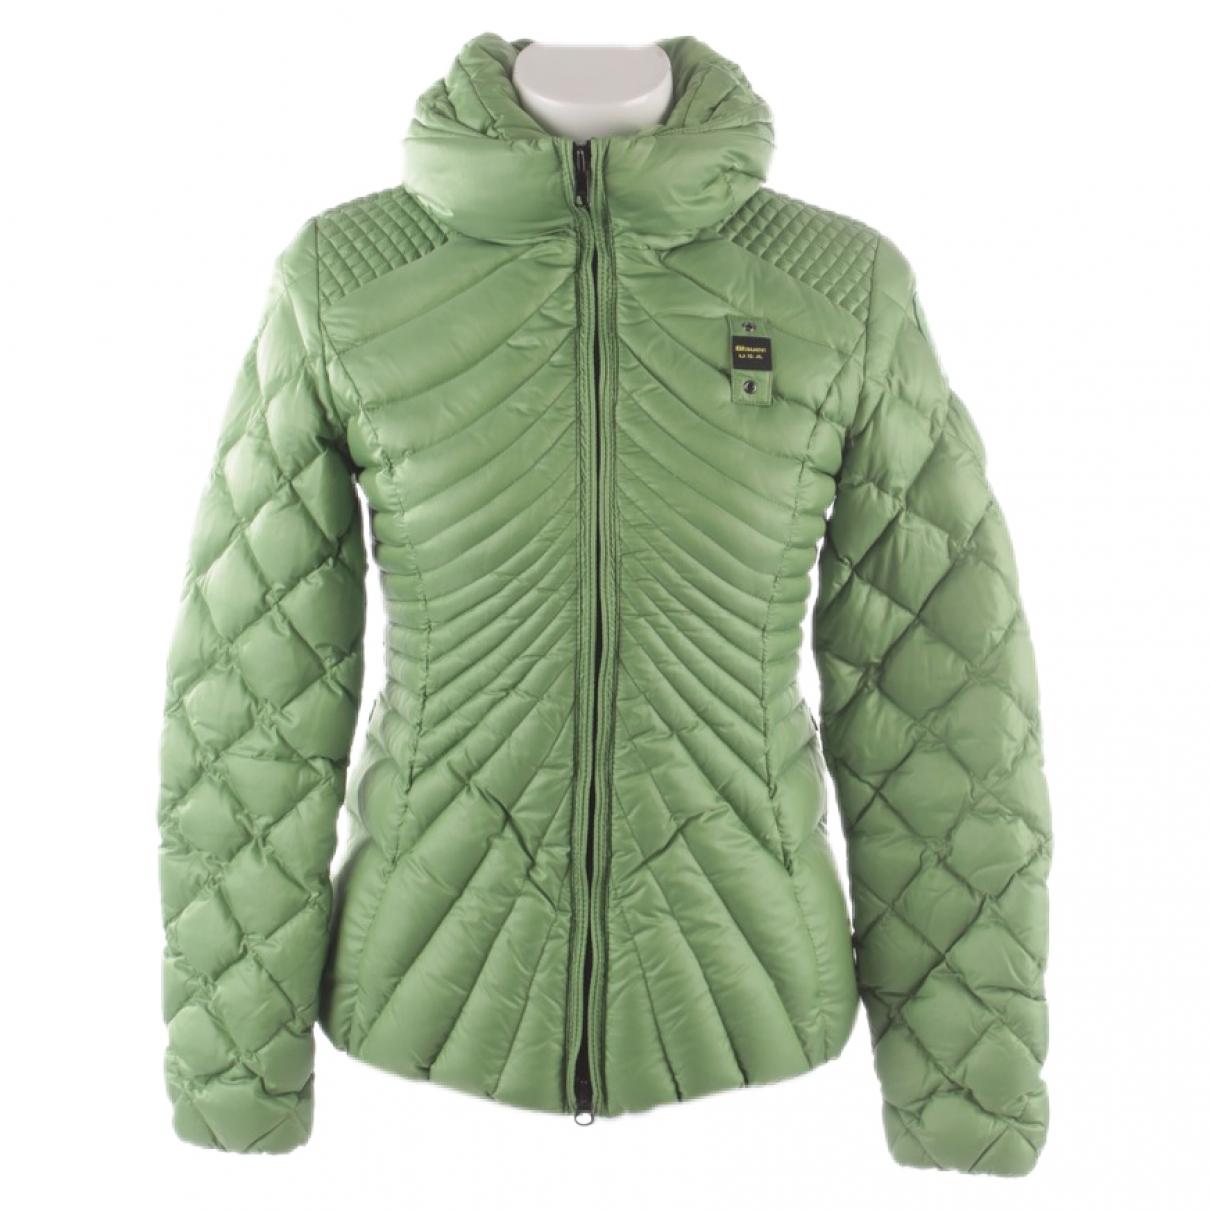 Blauer \N Green Cotton jacket for Women S International